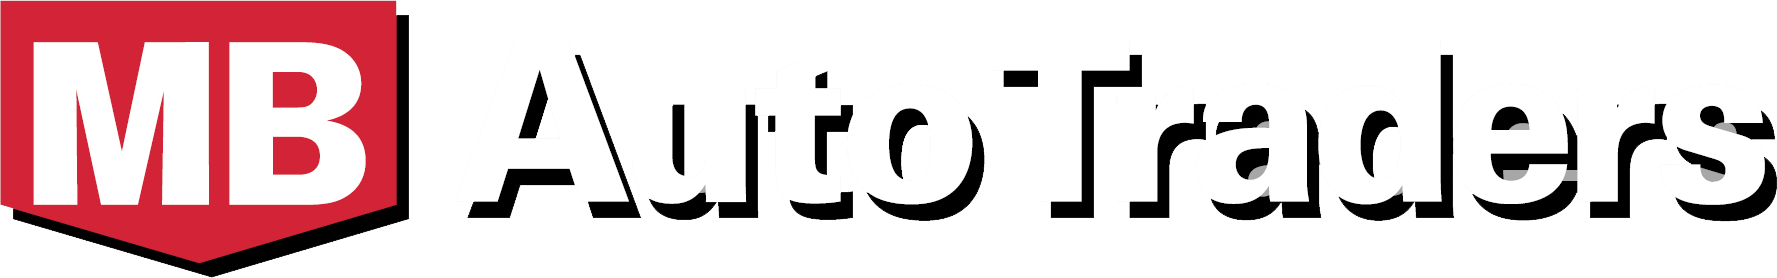 Myrtle Beach Auto Traders Logo